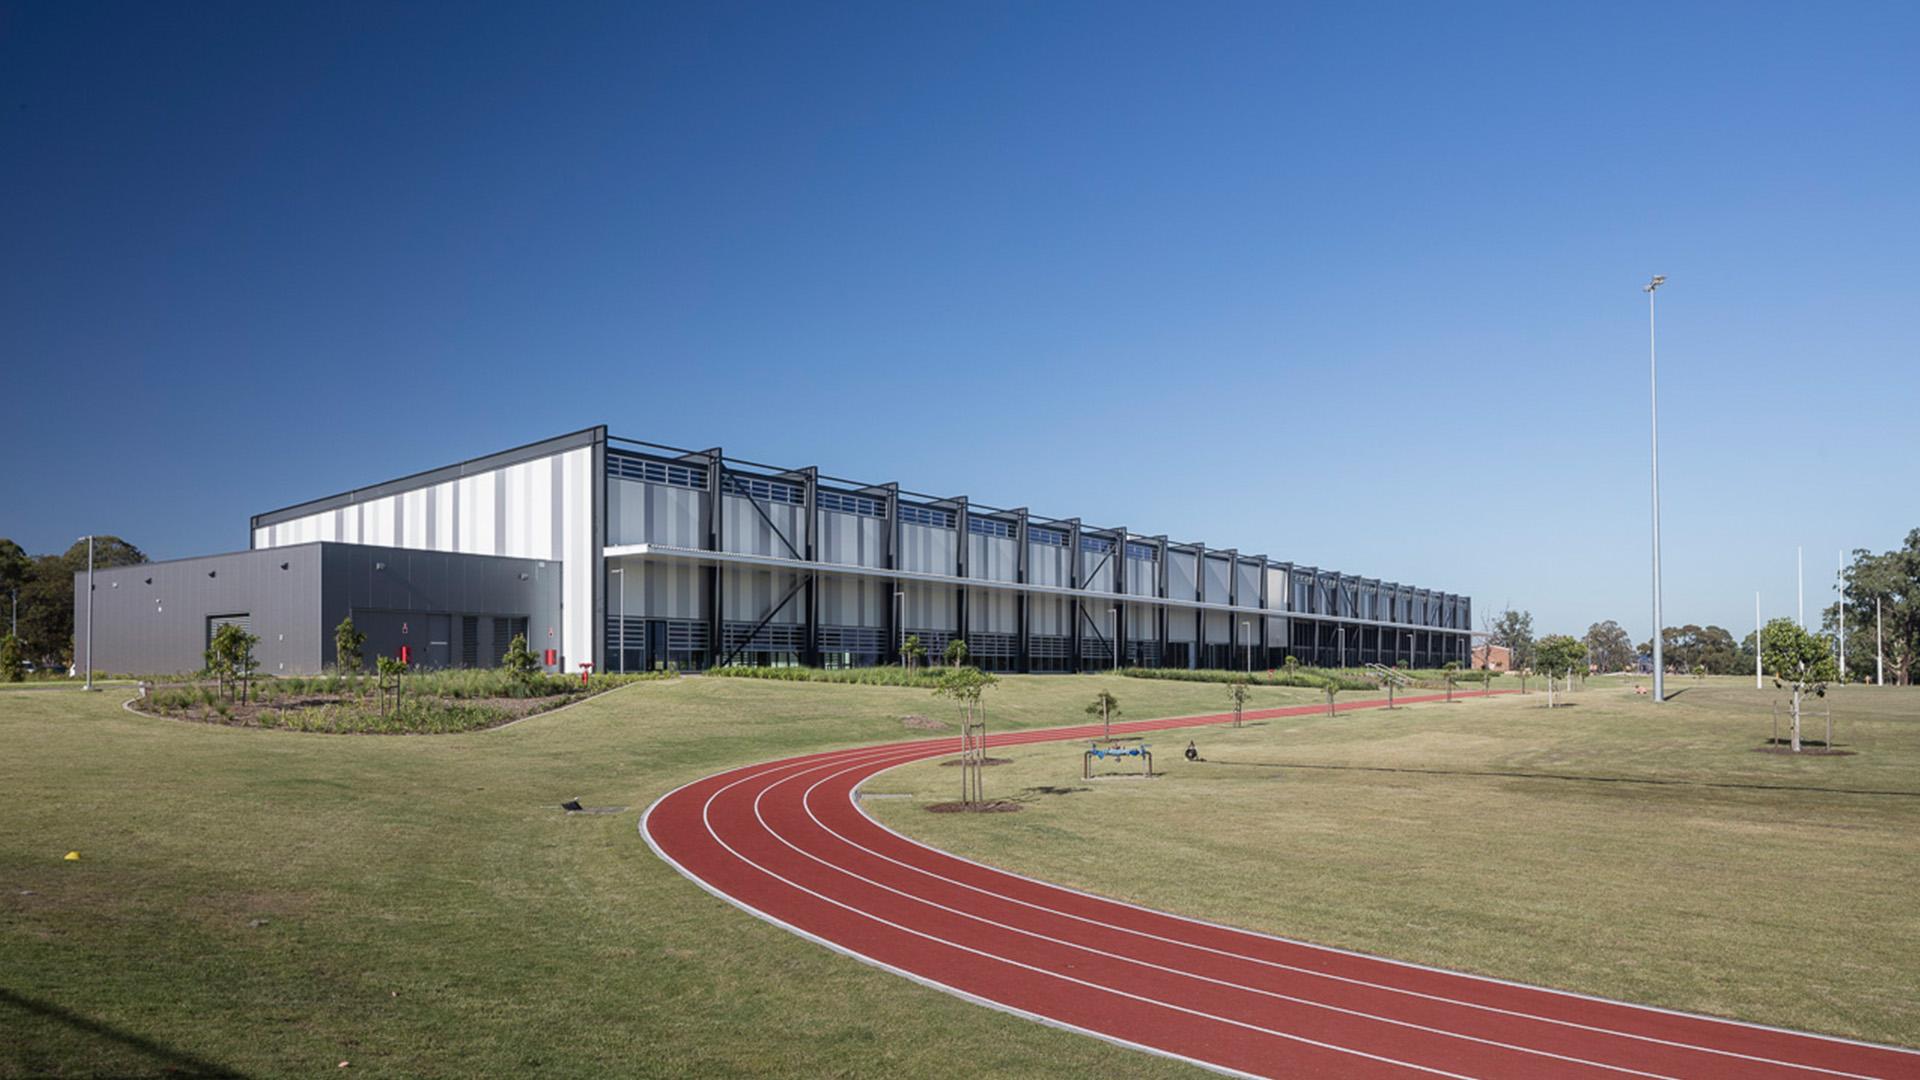 Holsworthy Barracks